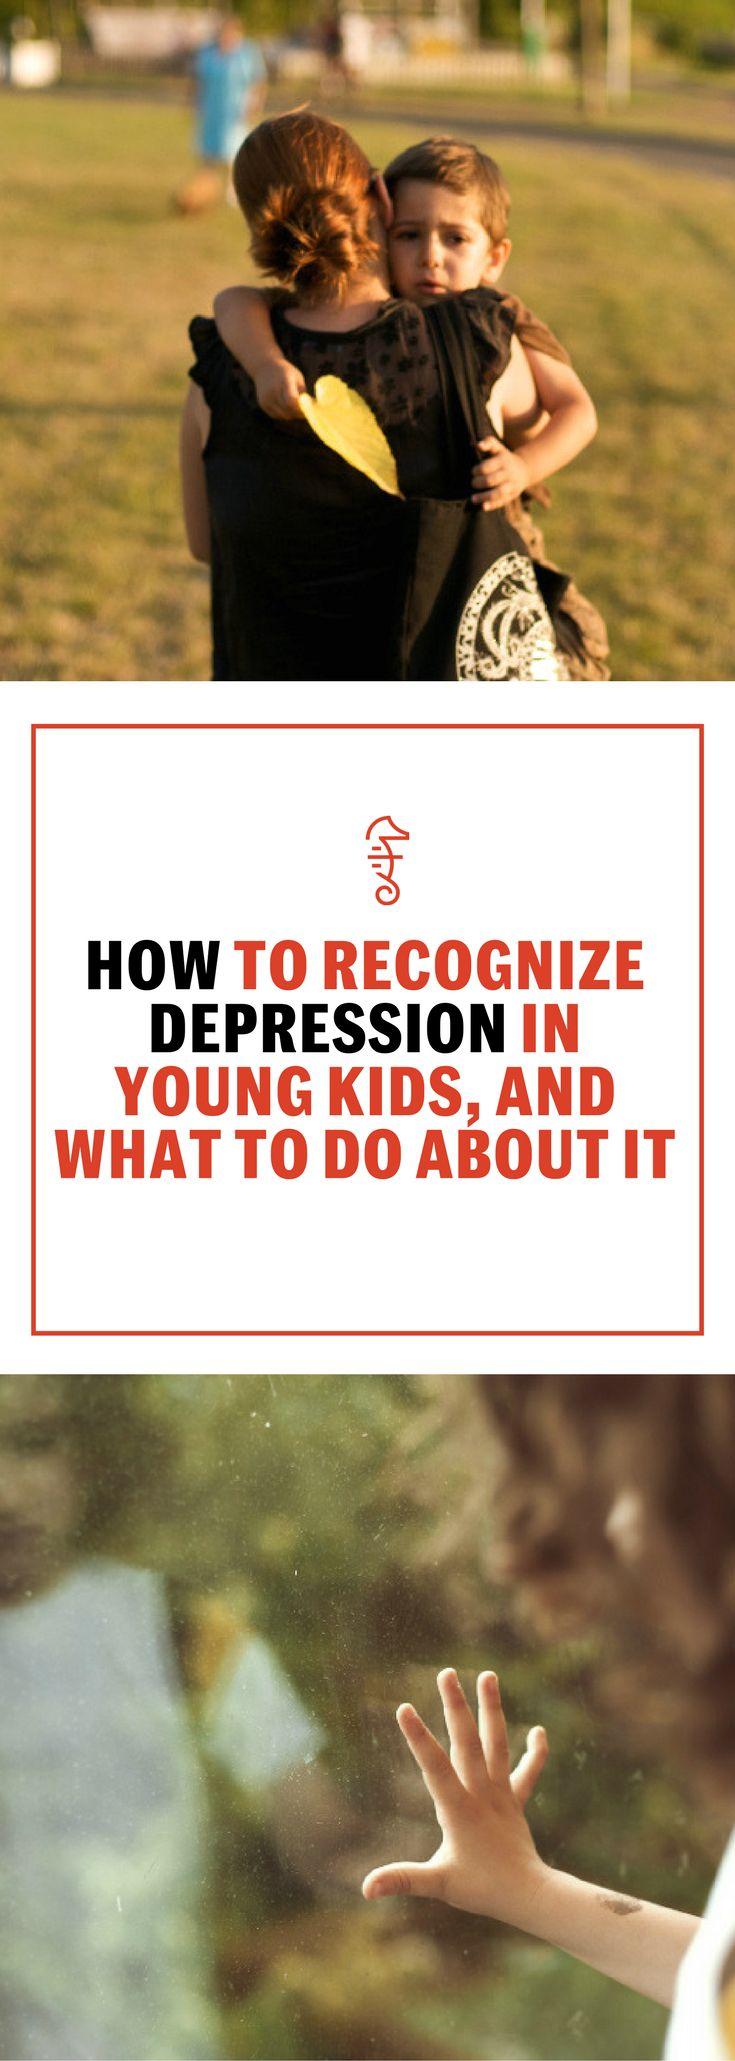 depression kids, depression kids coping skills, depression parents, depression coping skills, depression kids mental health